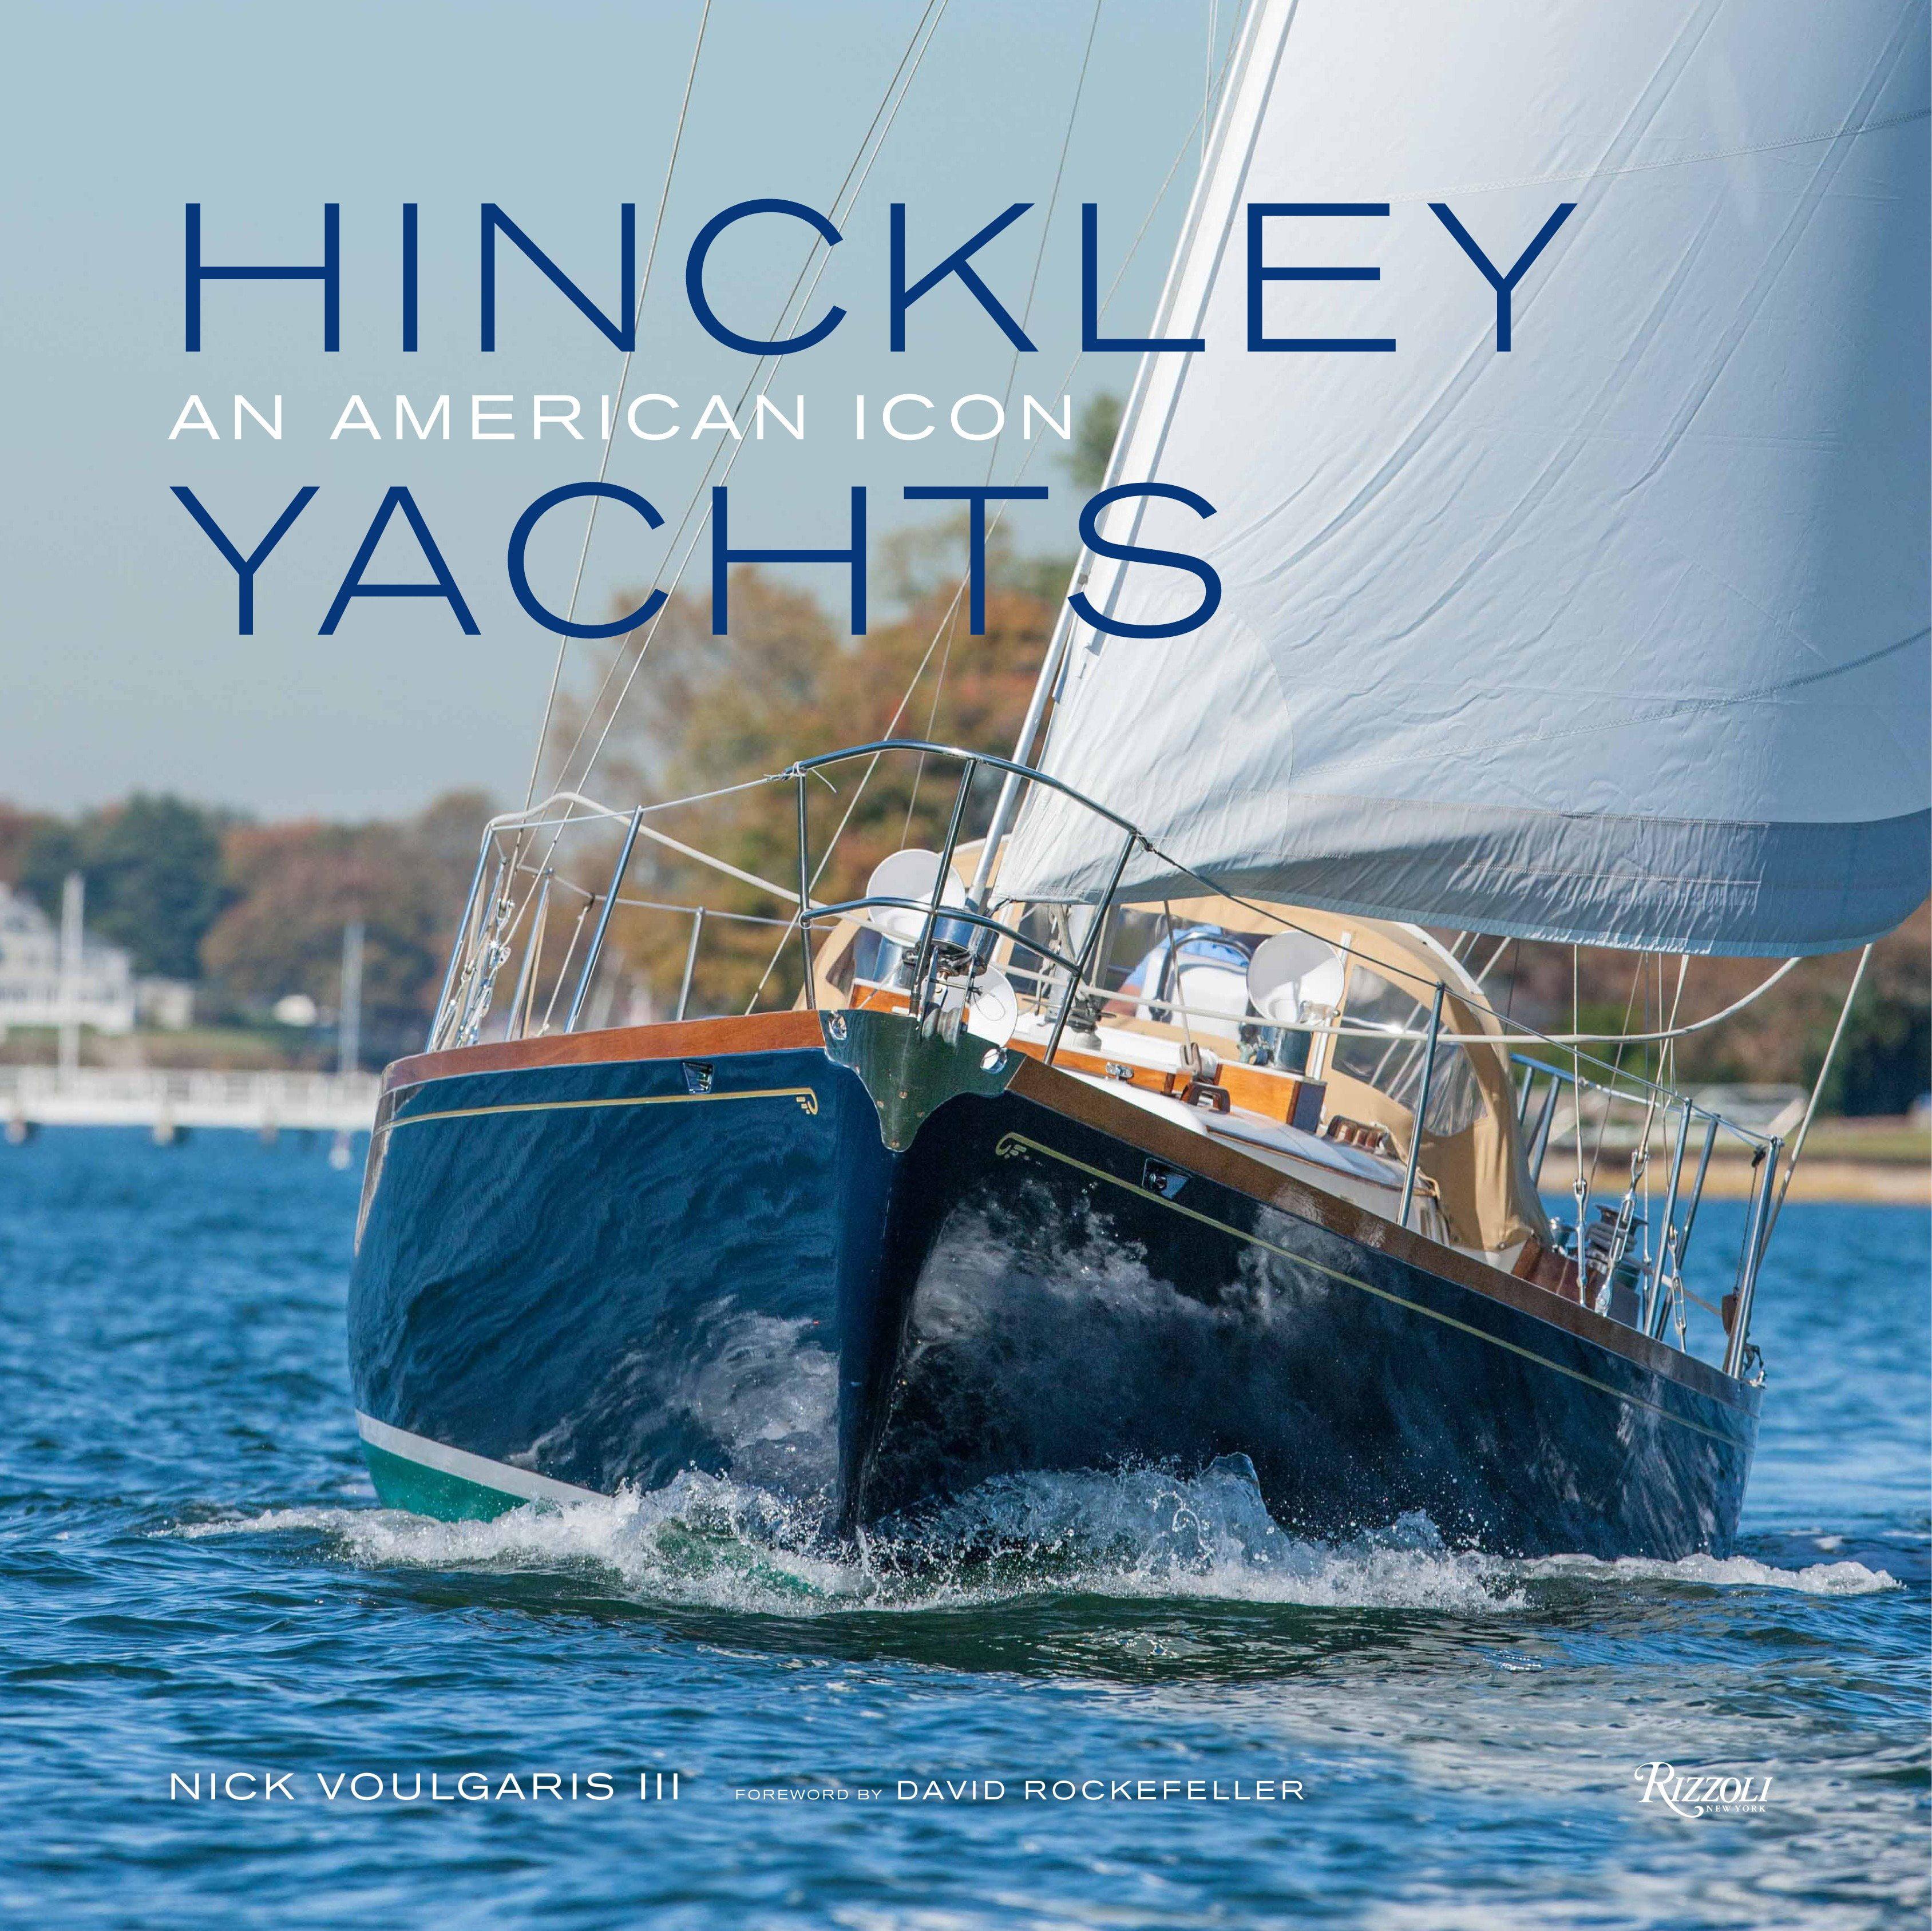 Hinckley Yachts : An American Icon